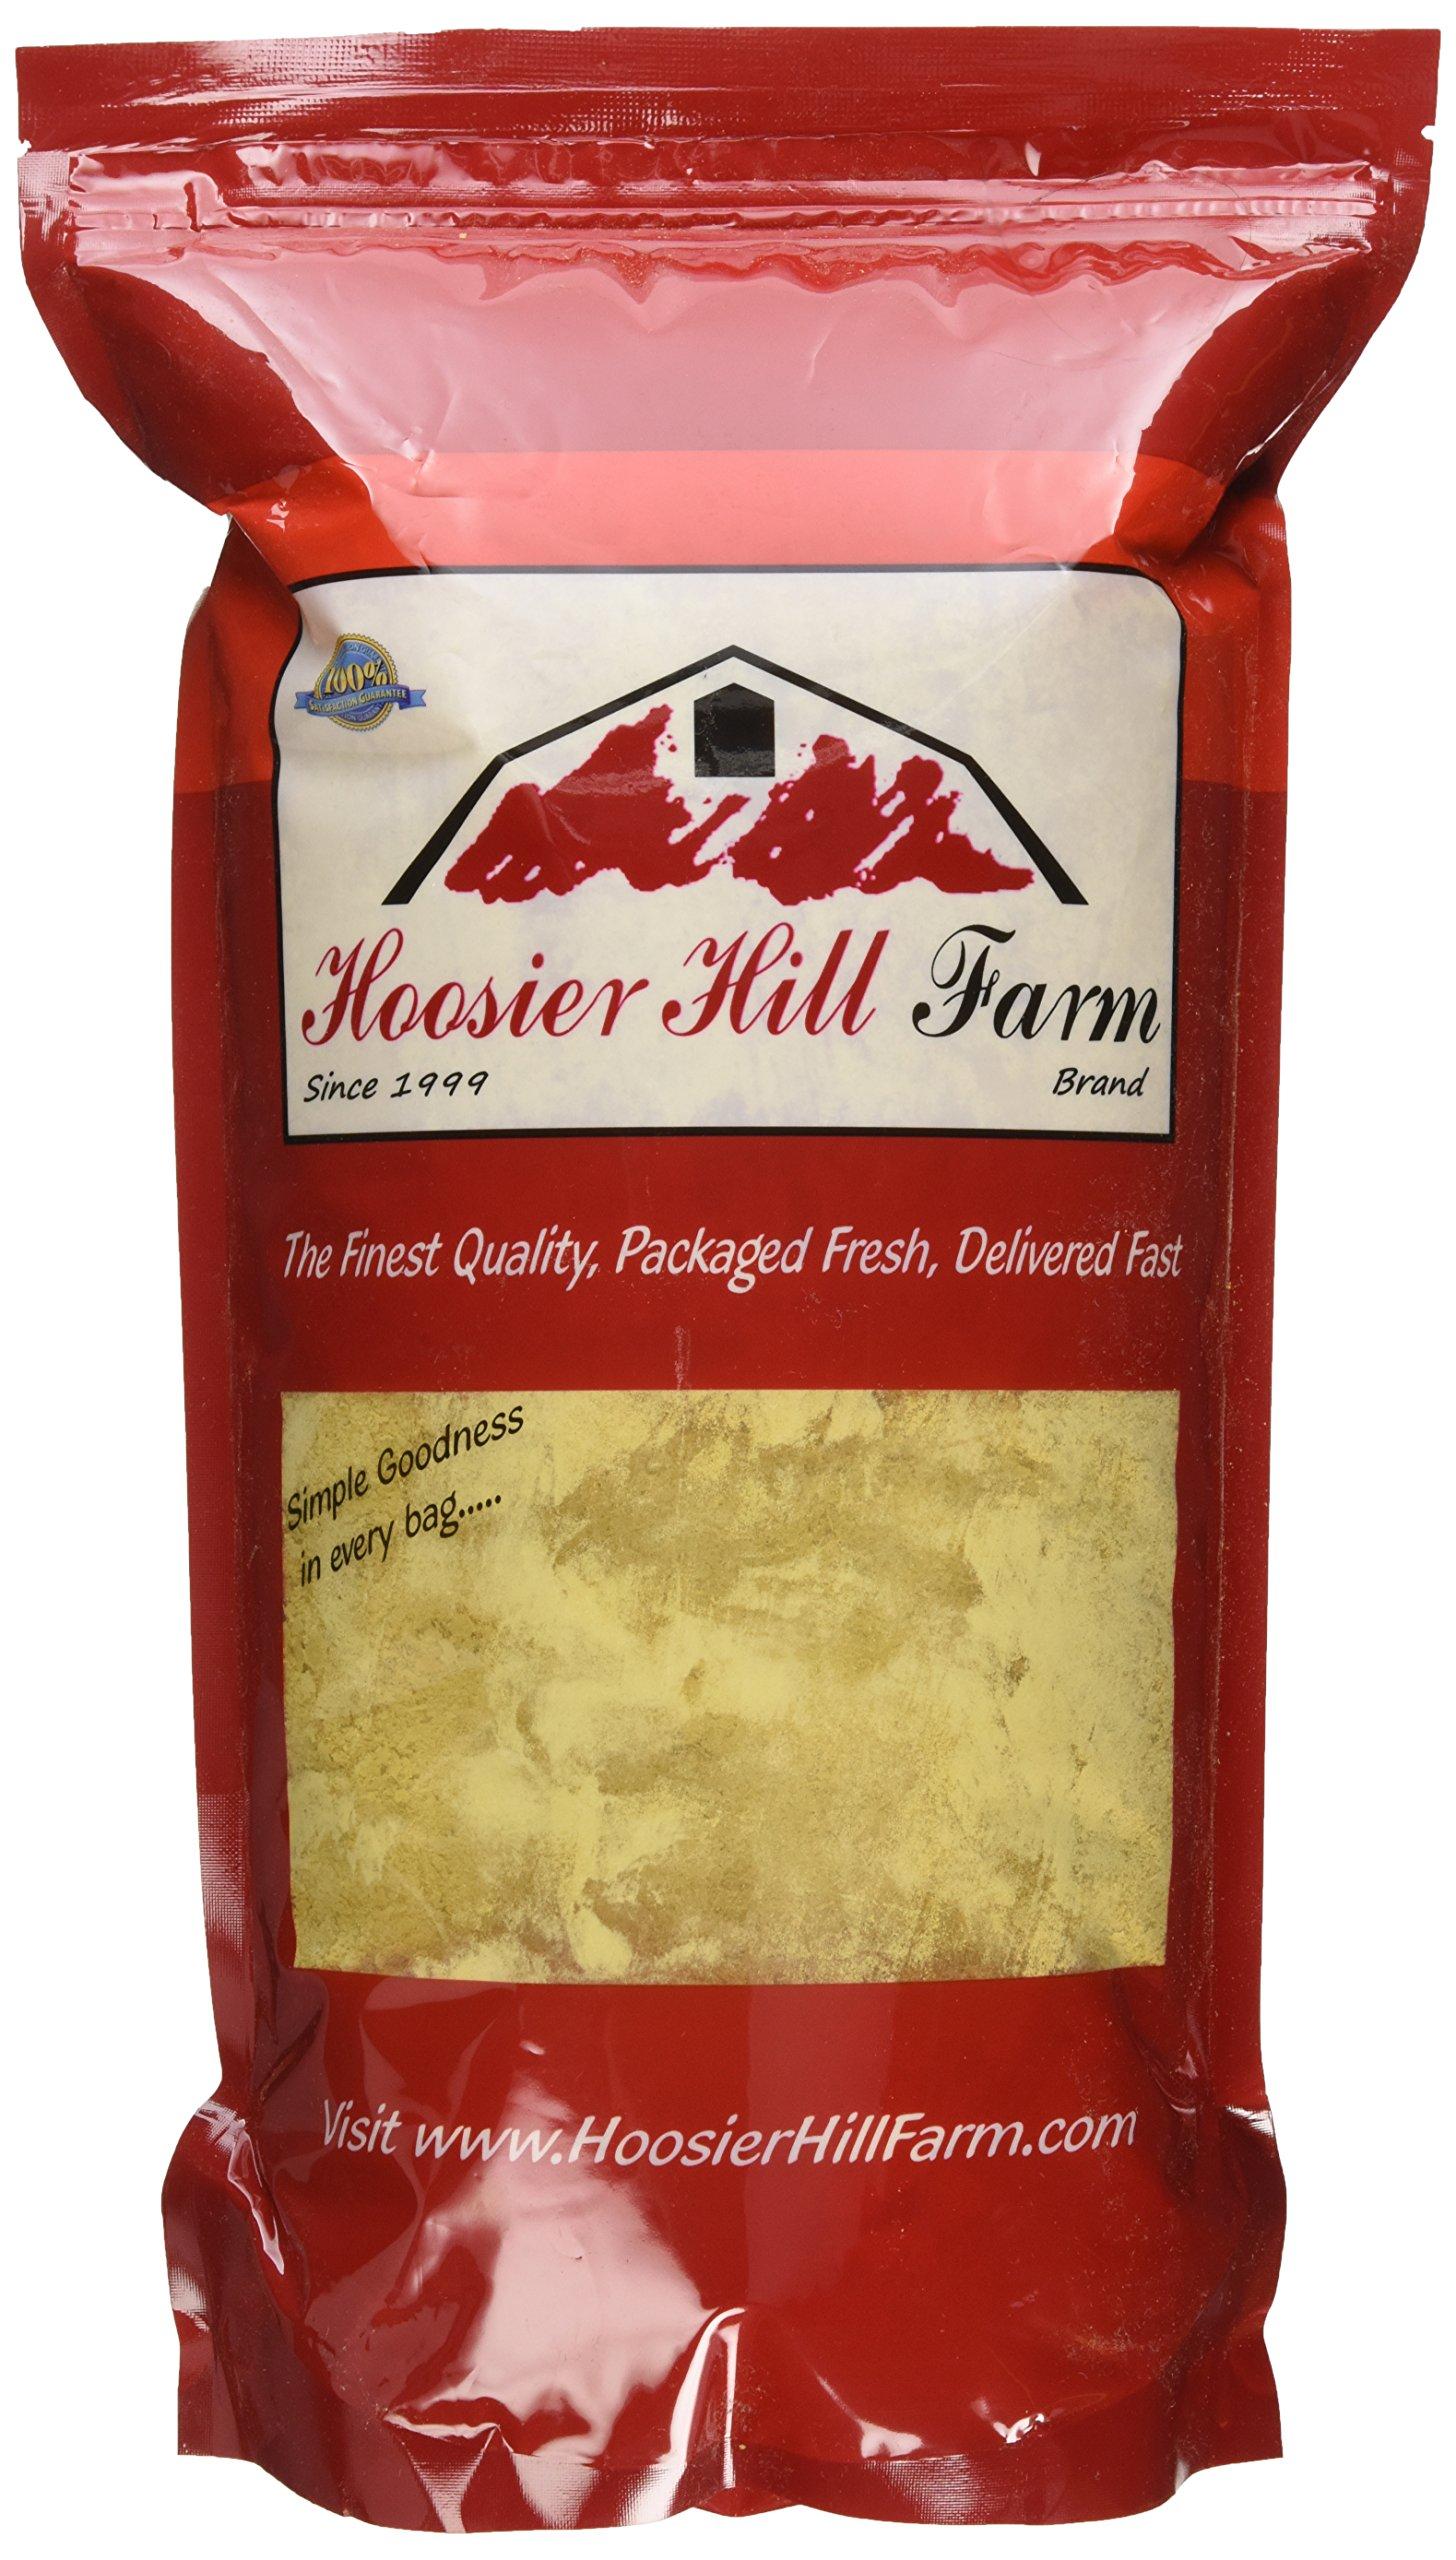 Hoosier Hill Farm Nutritional Yeast Flakes, Gigantic 3 pound bag by Hoosier Hill Farm (Image #2)